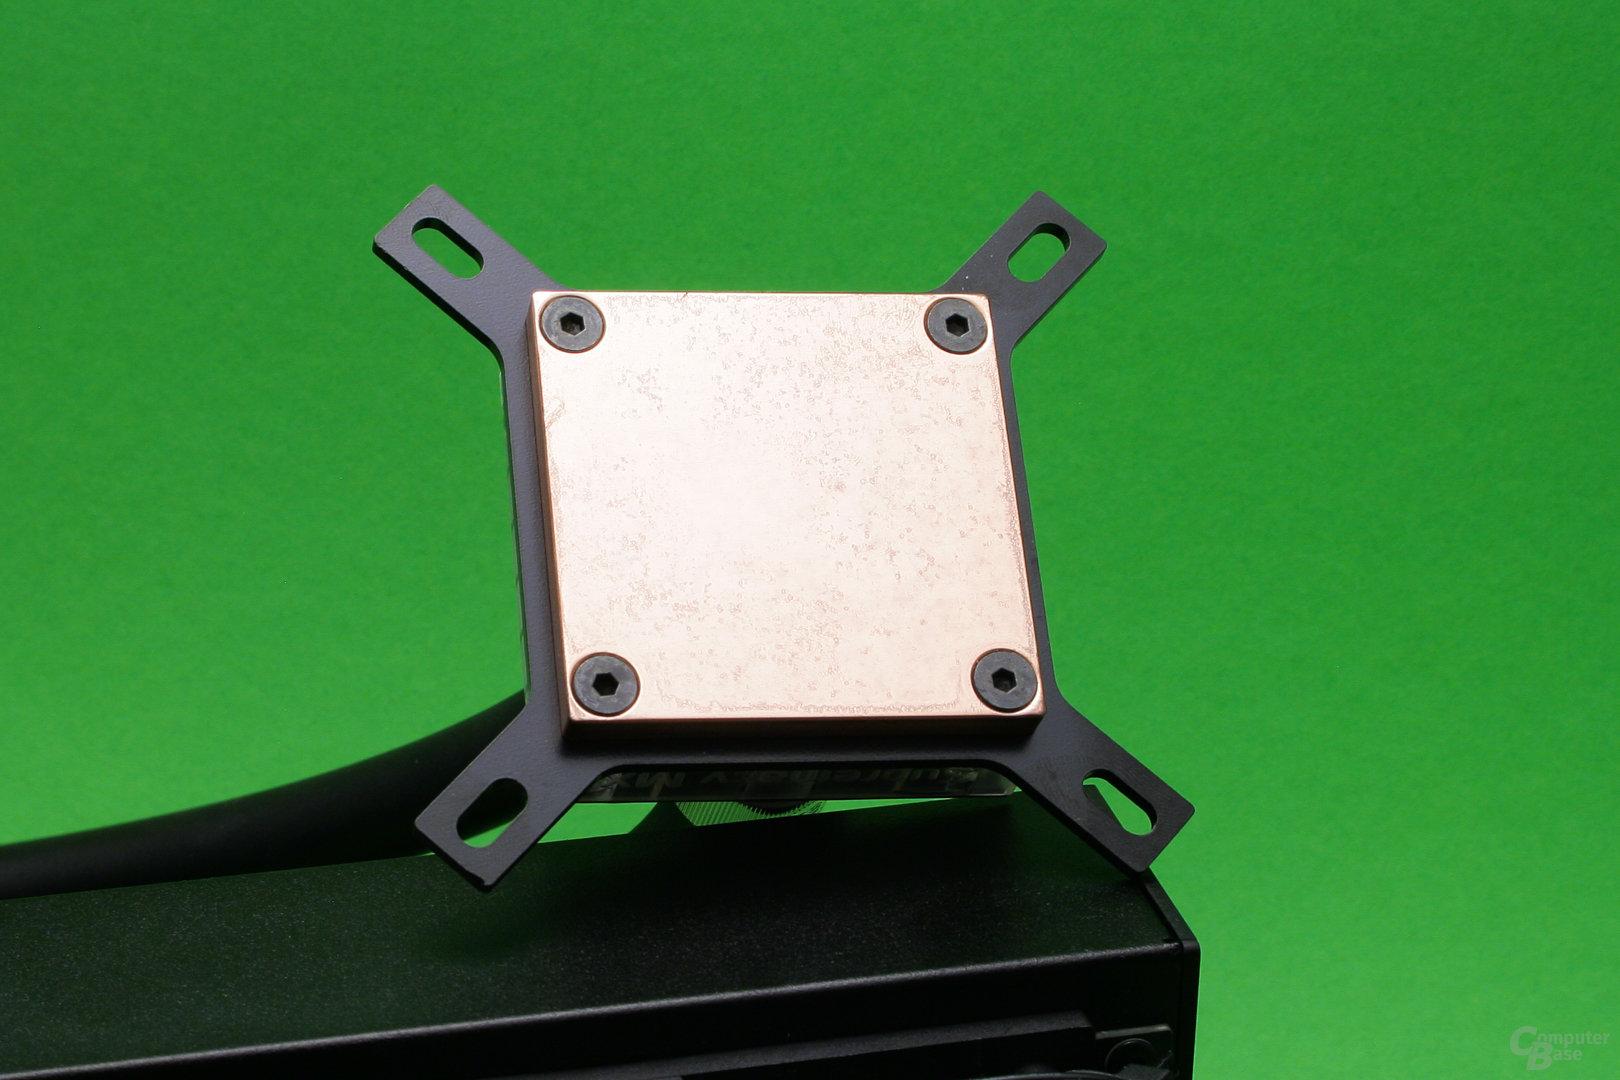 EK Predator 240: Bodenplatte des Kühlers